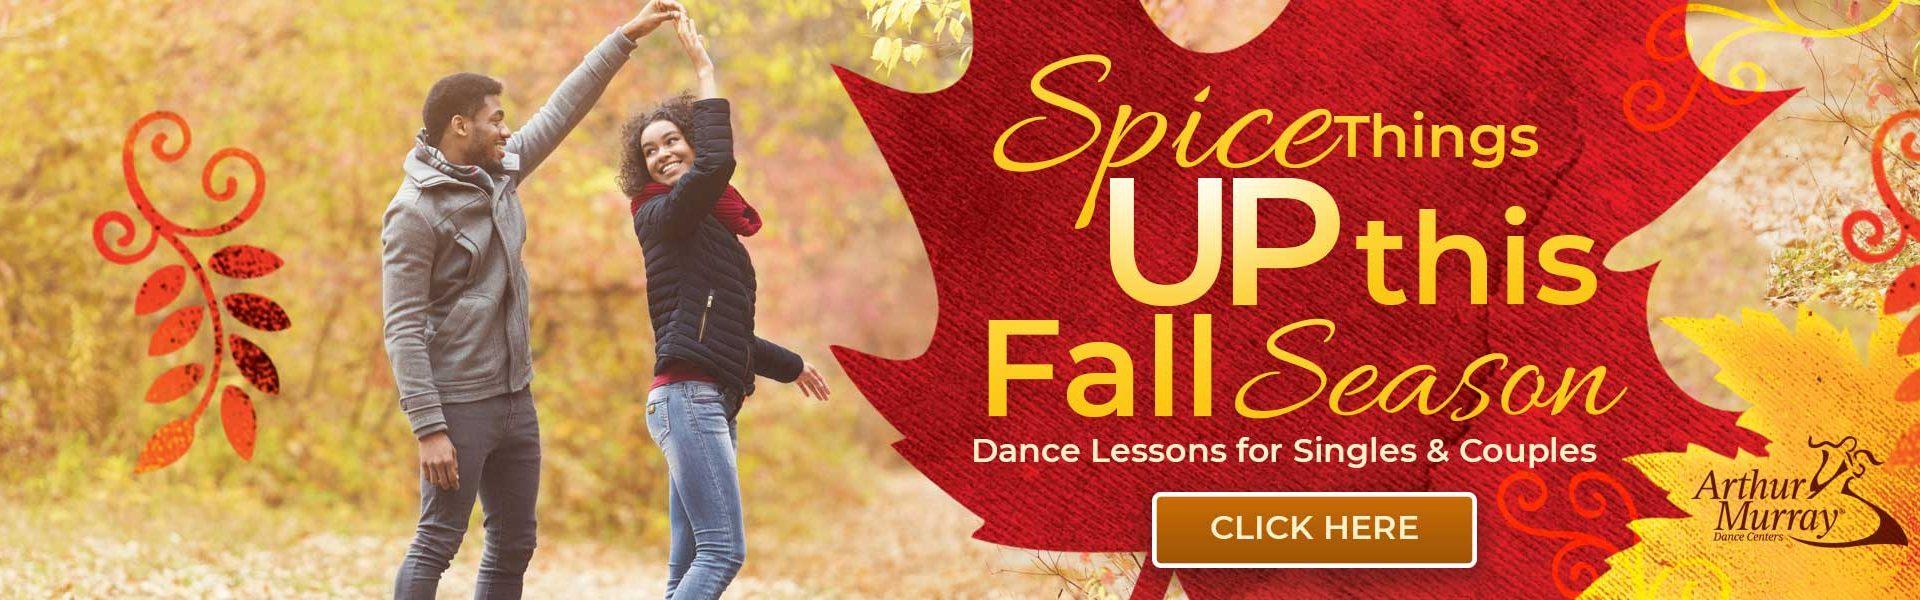 Arthur Murray Mississauga Fall Dance Lessons